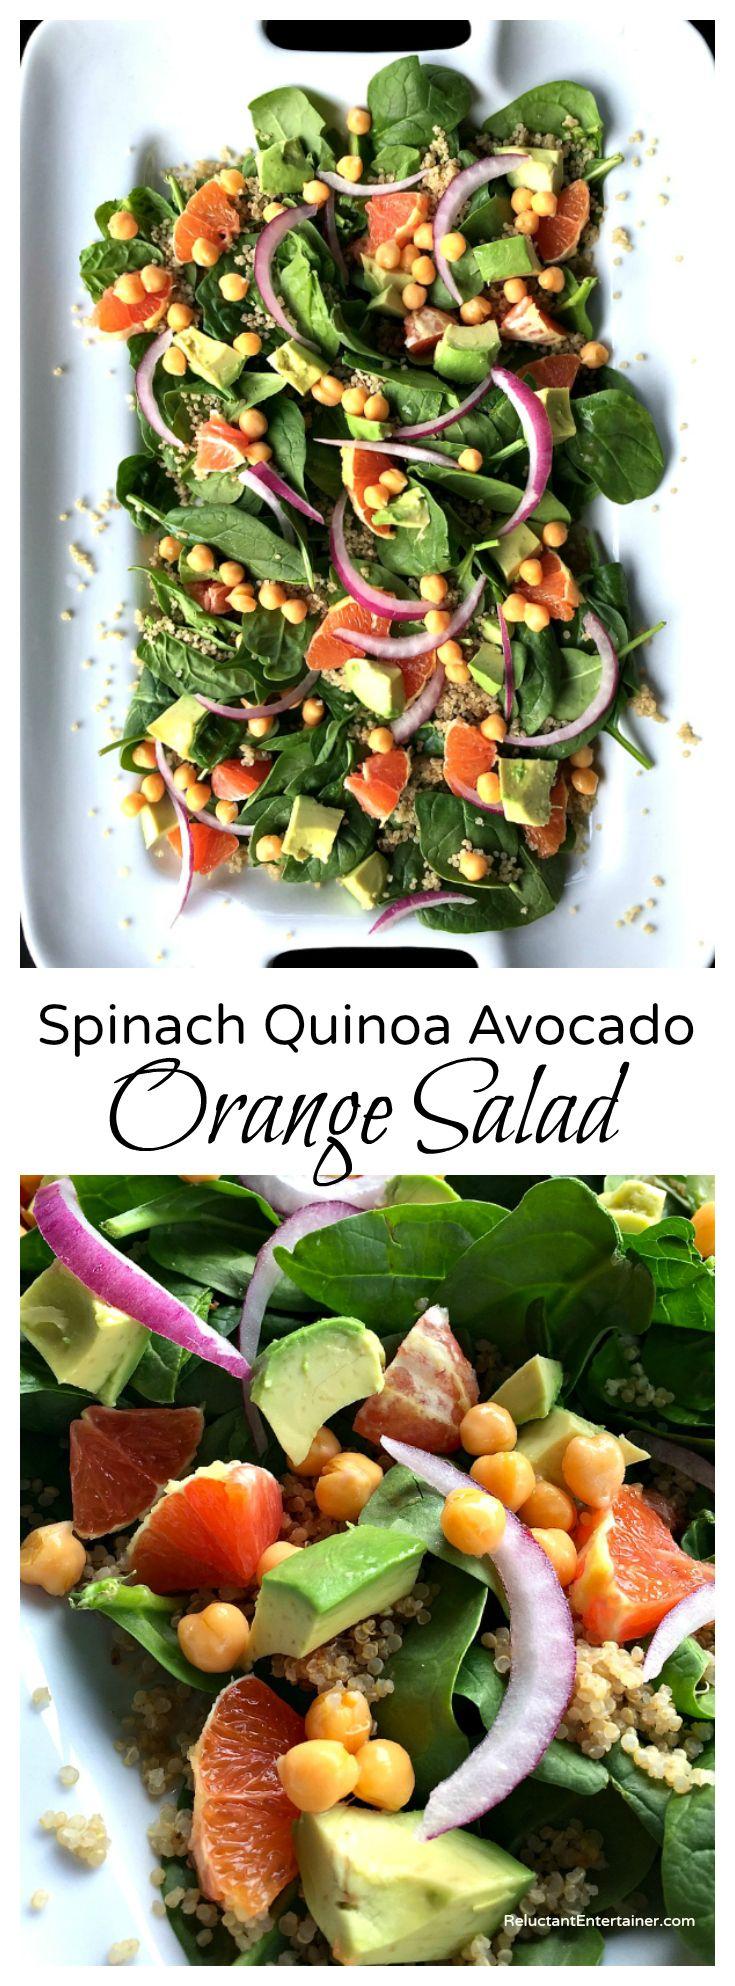 Spinach Quinoa Avocado Orange Salad